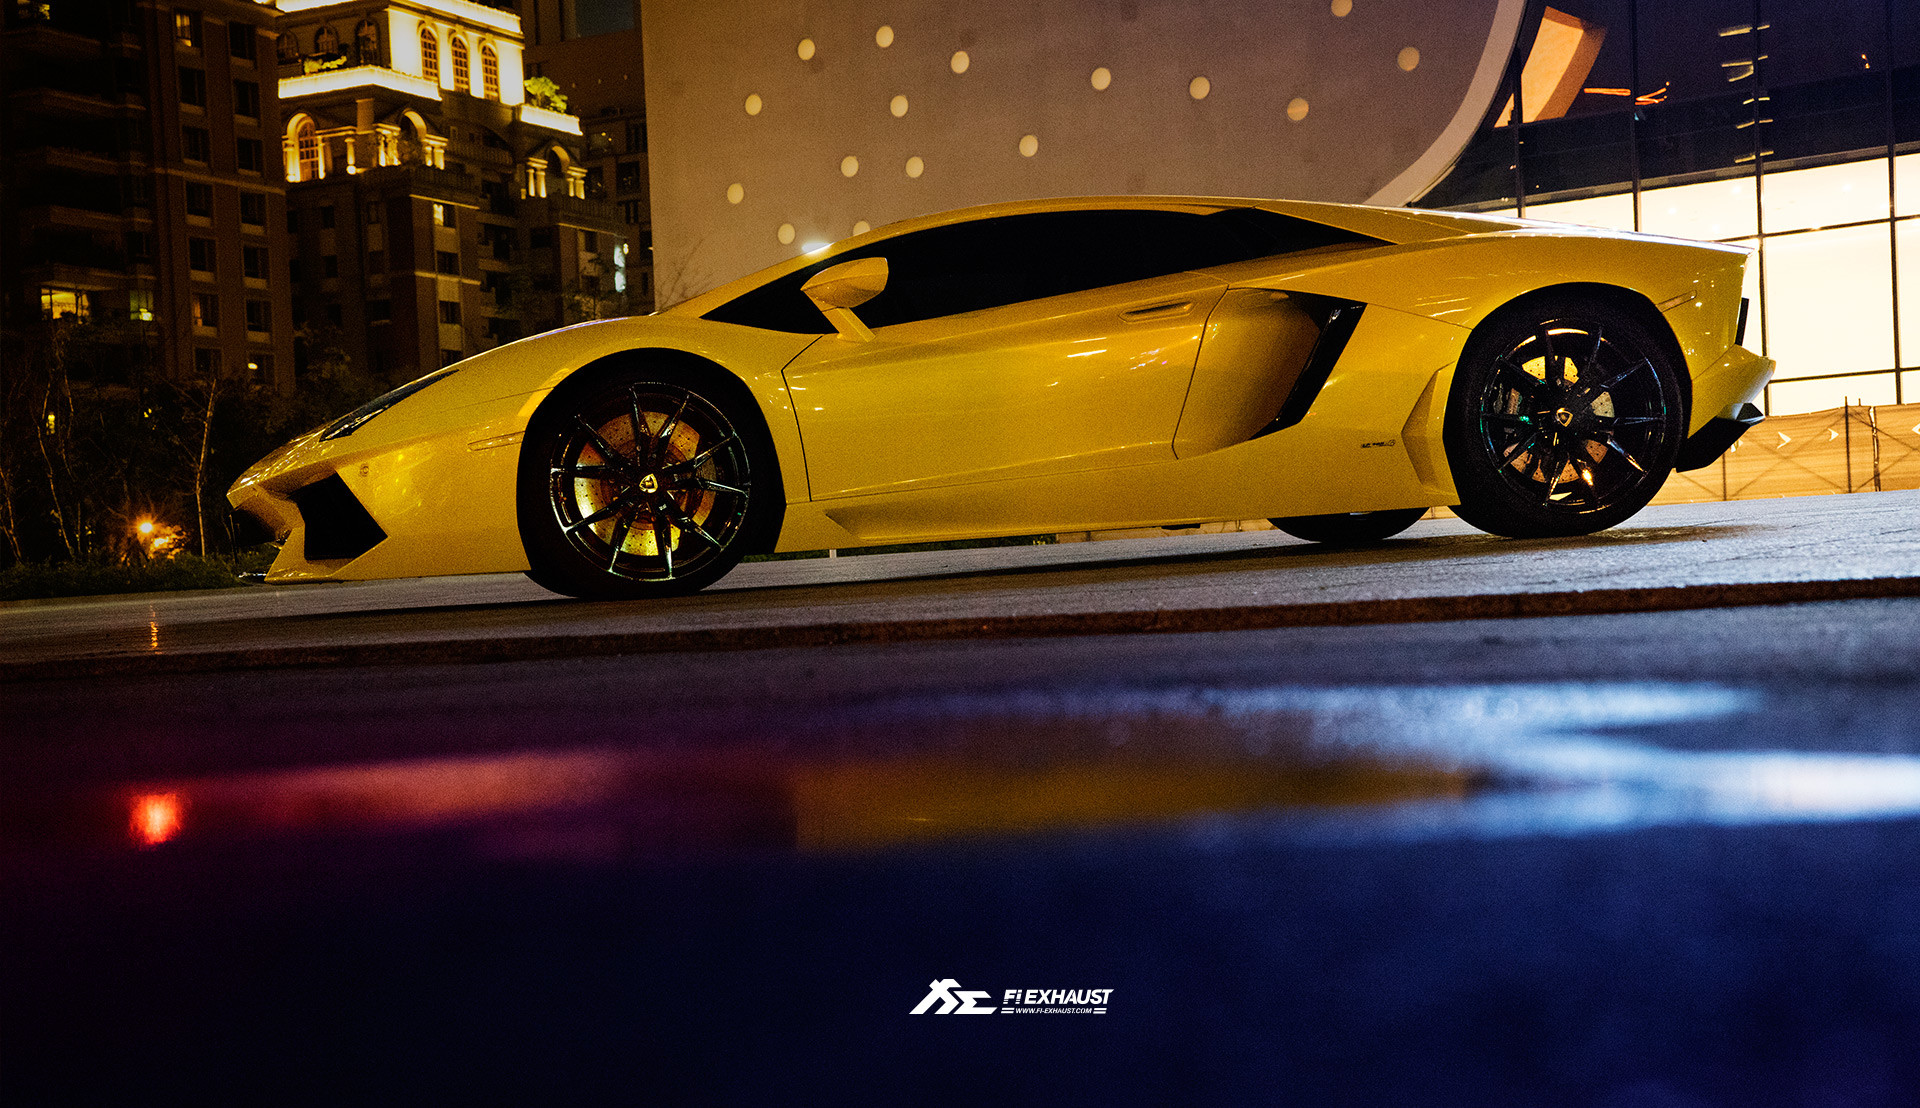 … Lamborghini LP700 yellow Wallpaper …